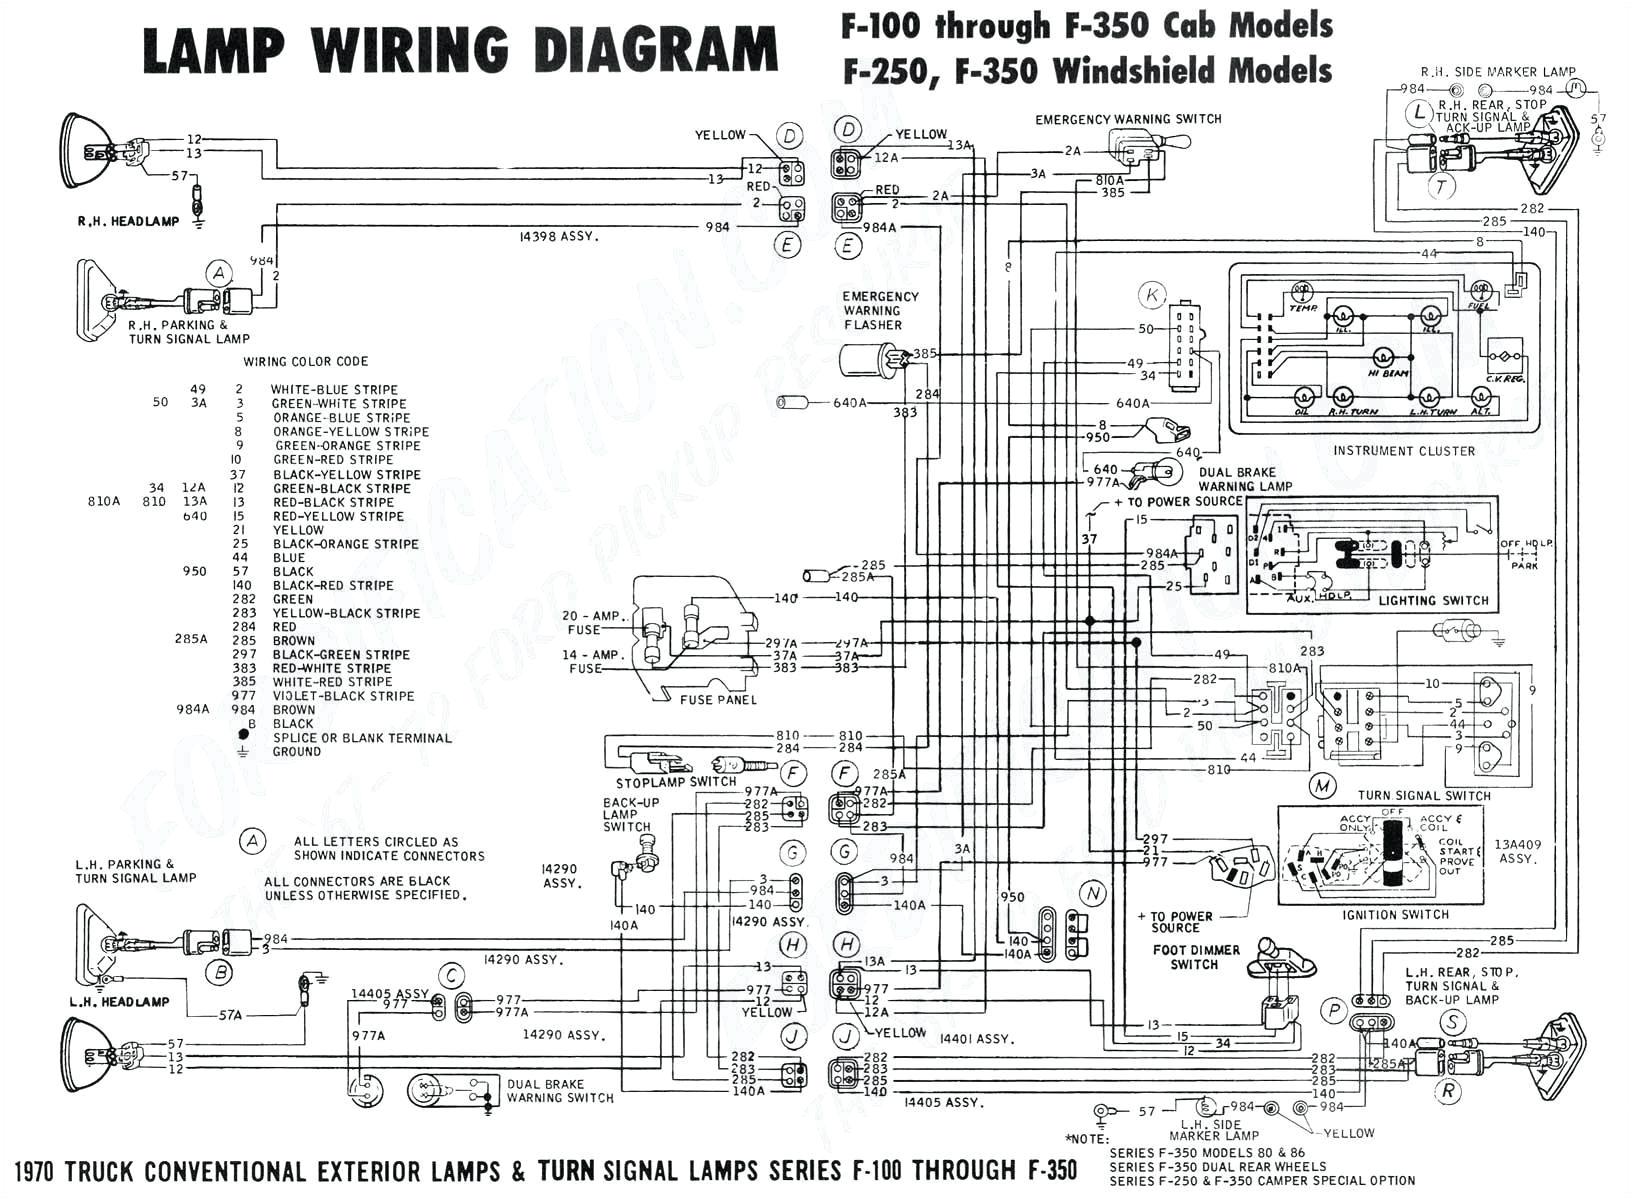 Watt Stopper Power Pack Wiring Diagram Watt Stopper Dimming Wiring Diagram My Wiring Diagram